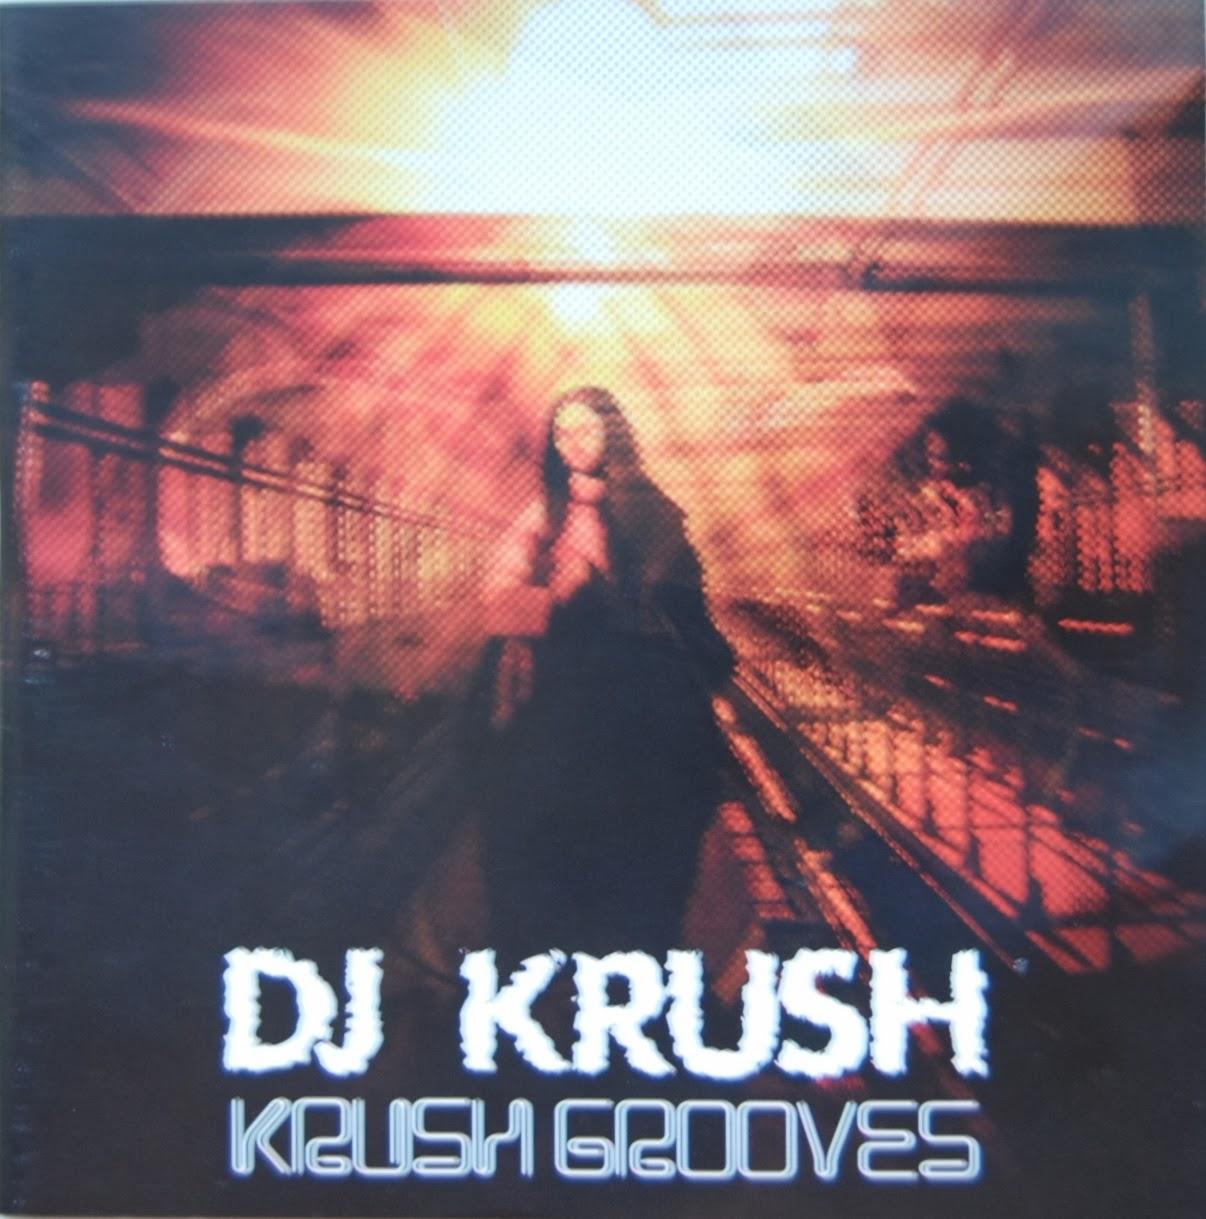 DJ Krush - Tragicomic